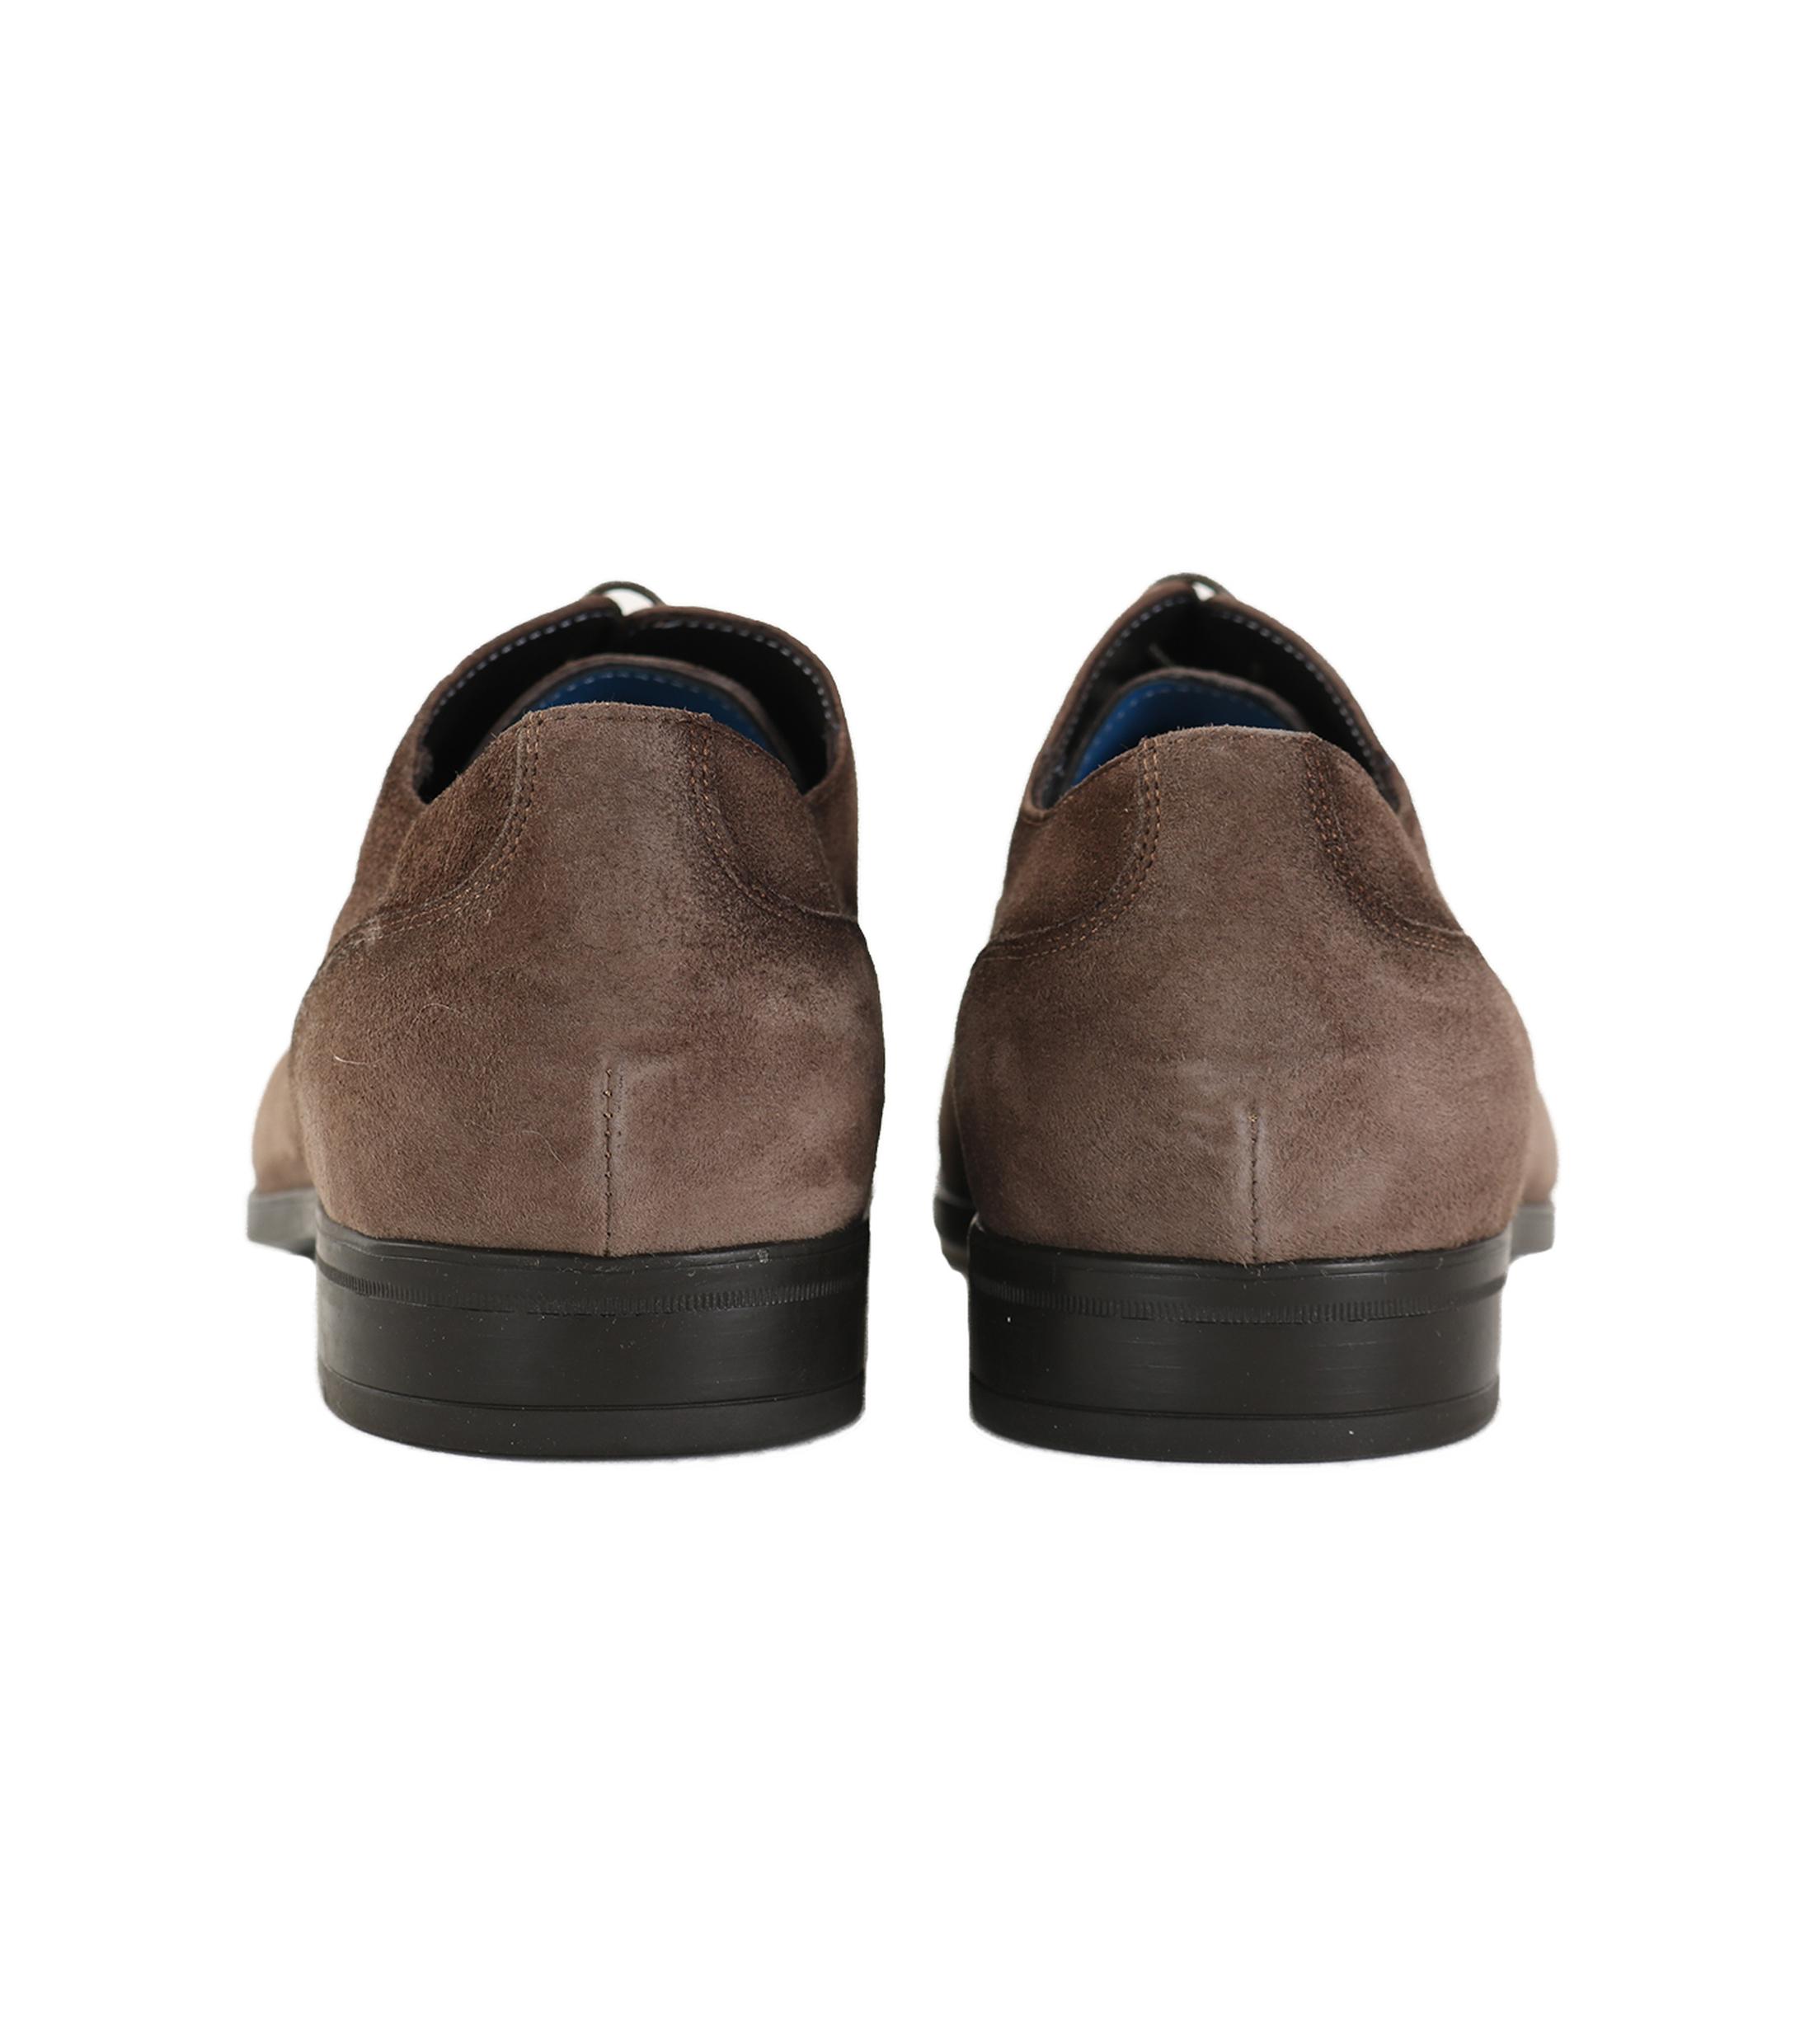 Giorgio Suede Shoes Brown foto 2